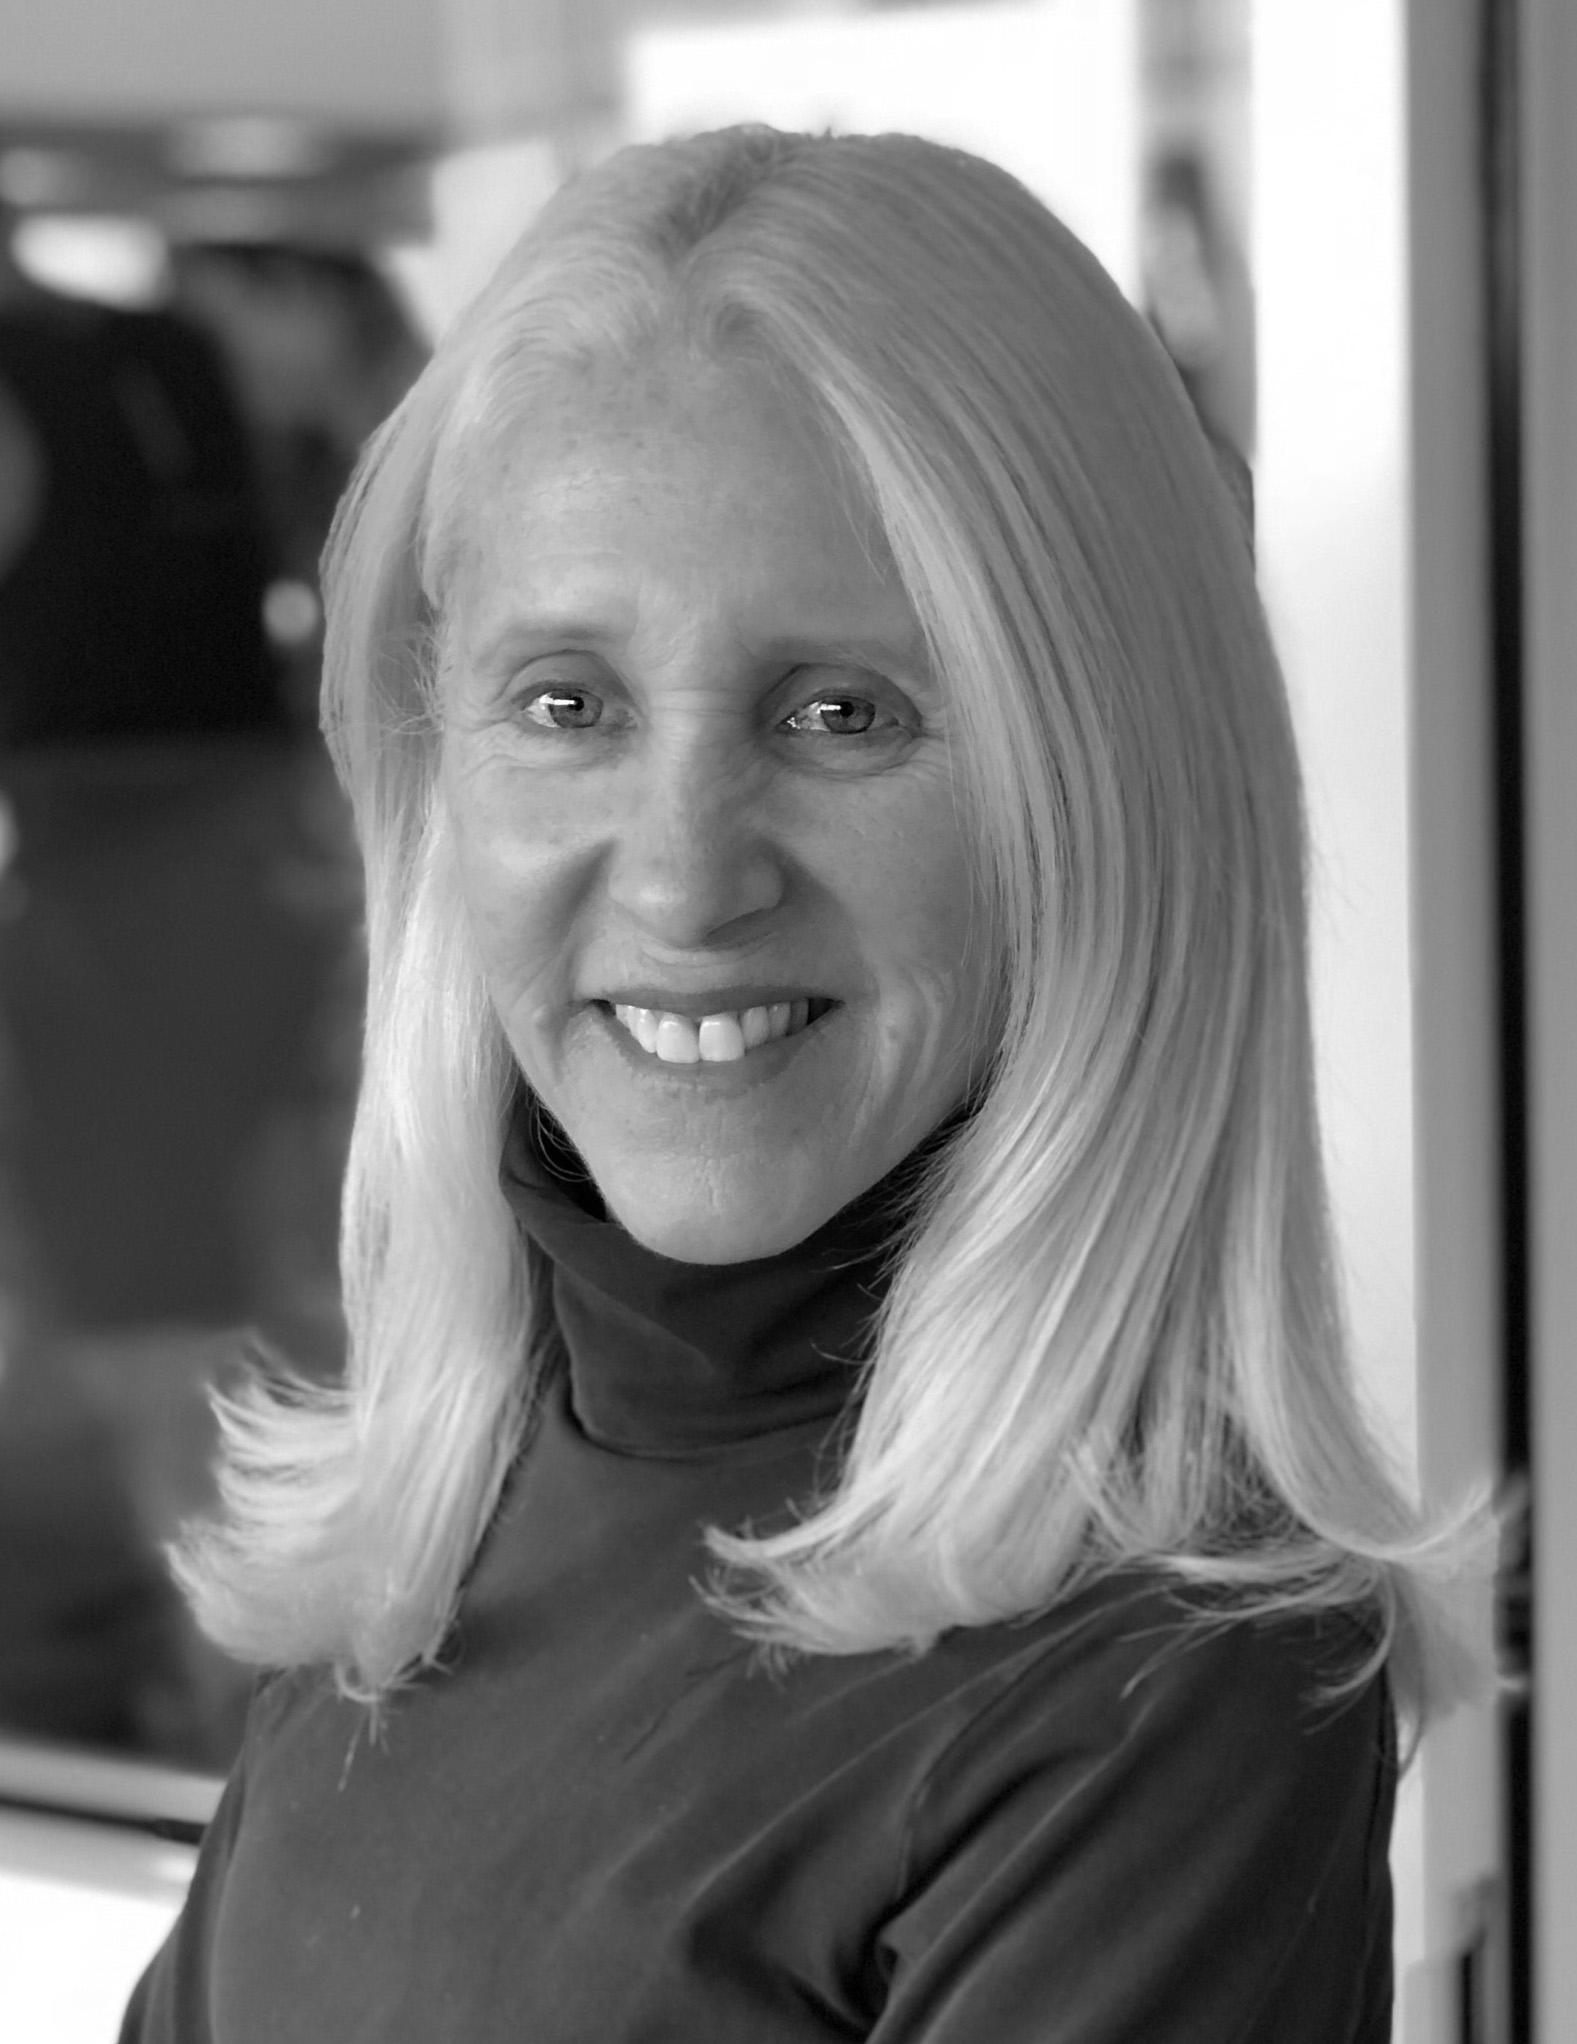 Barbara Feldscher